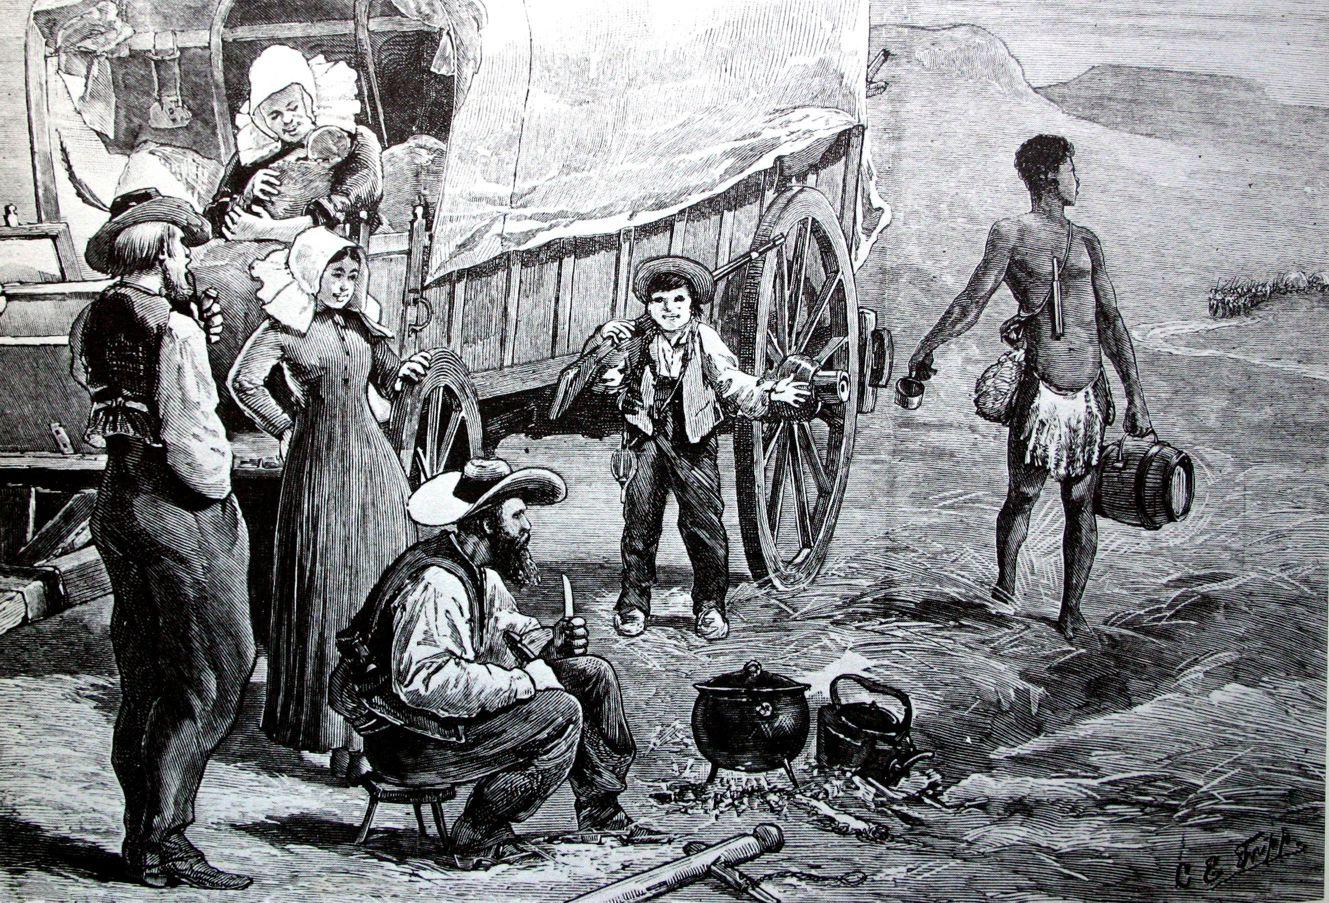 kolonisert land i afrika